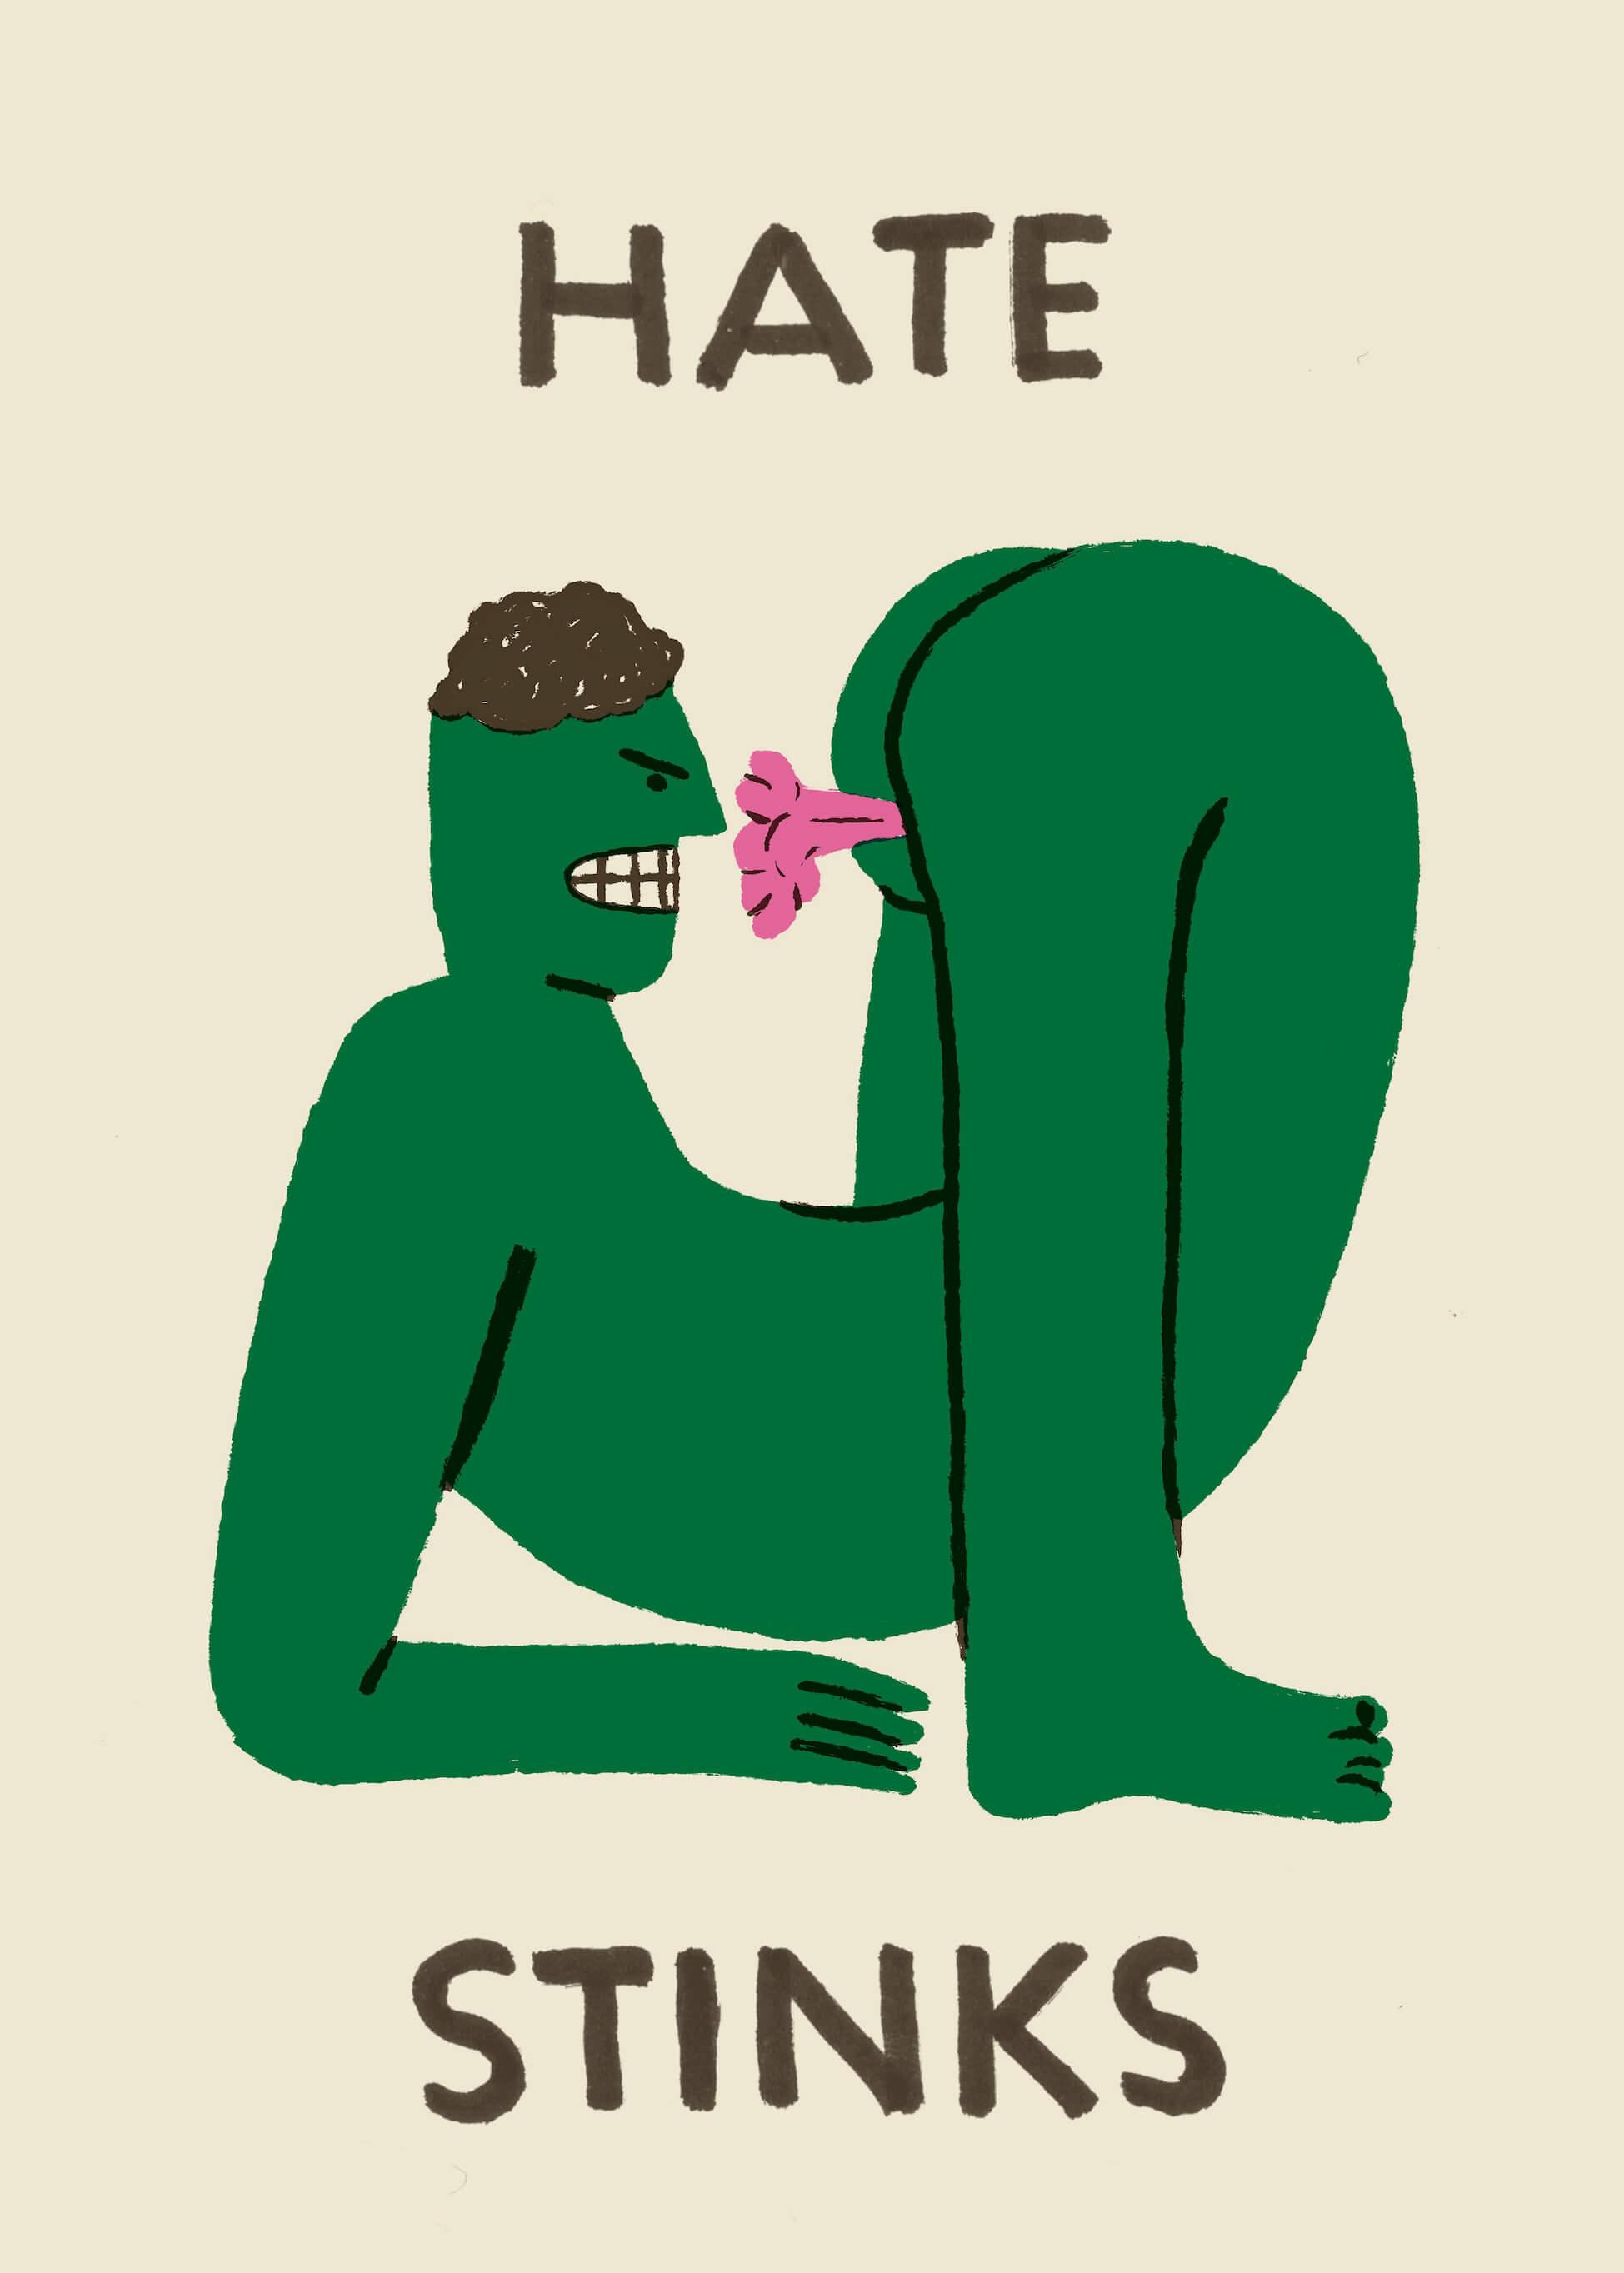 Hate Stinks (series 2/2) main image